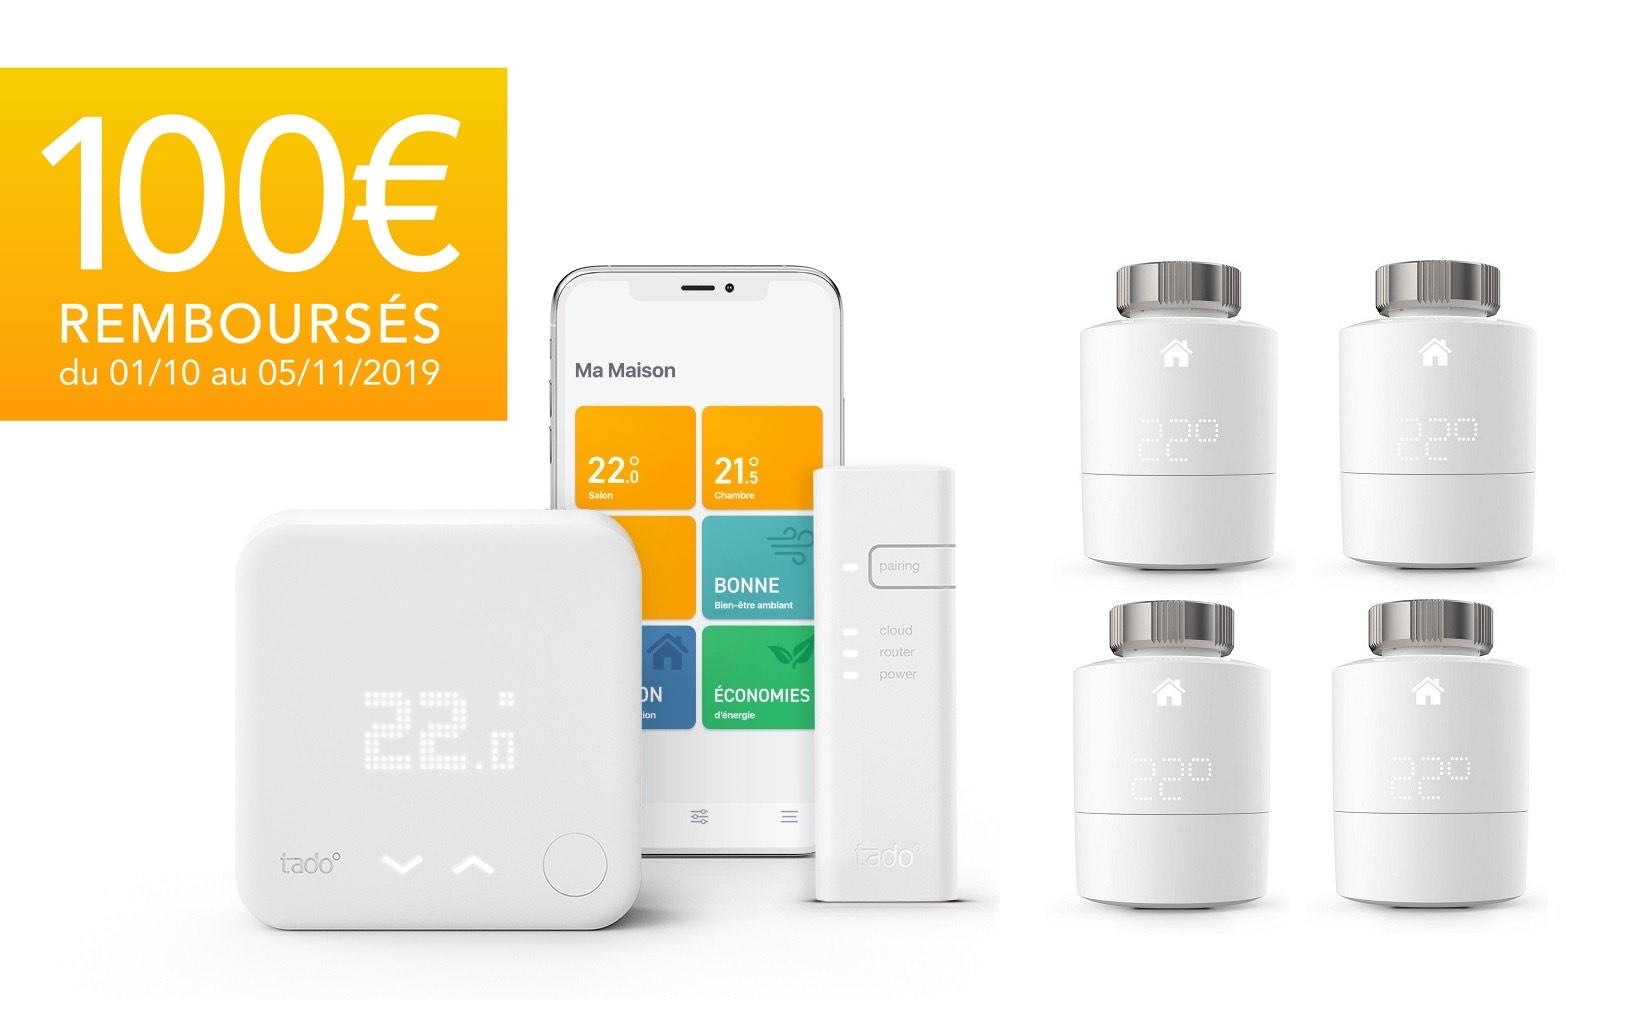 Thermostat intelligent Tado Starter Kit Thermostat Intelligent + 4 Têt (Via ODR de 100€)